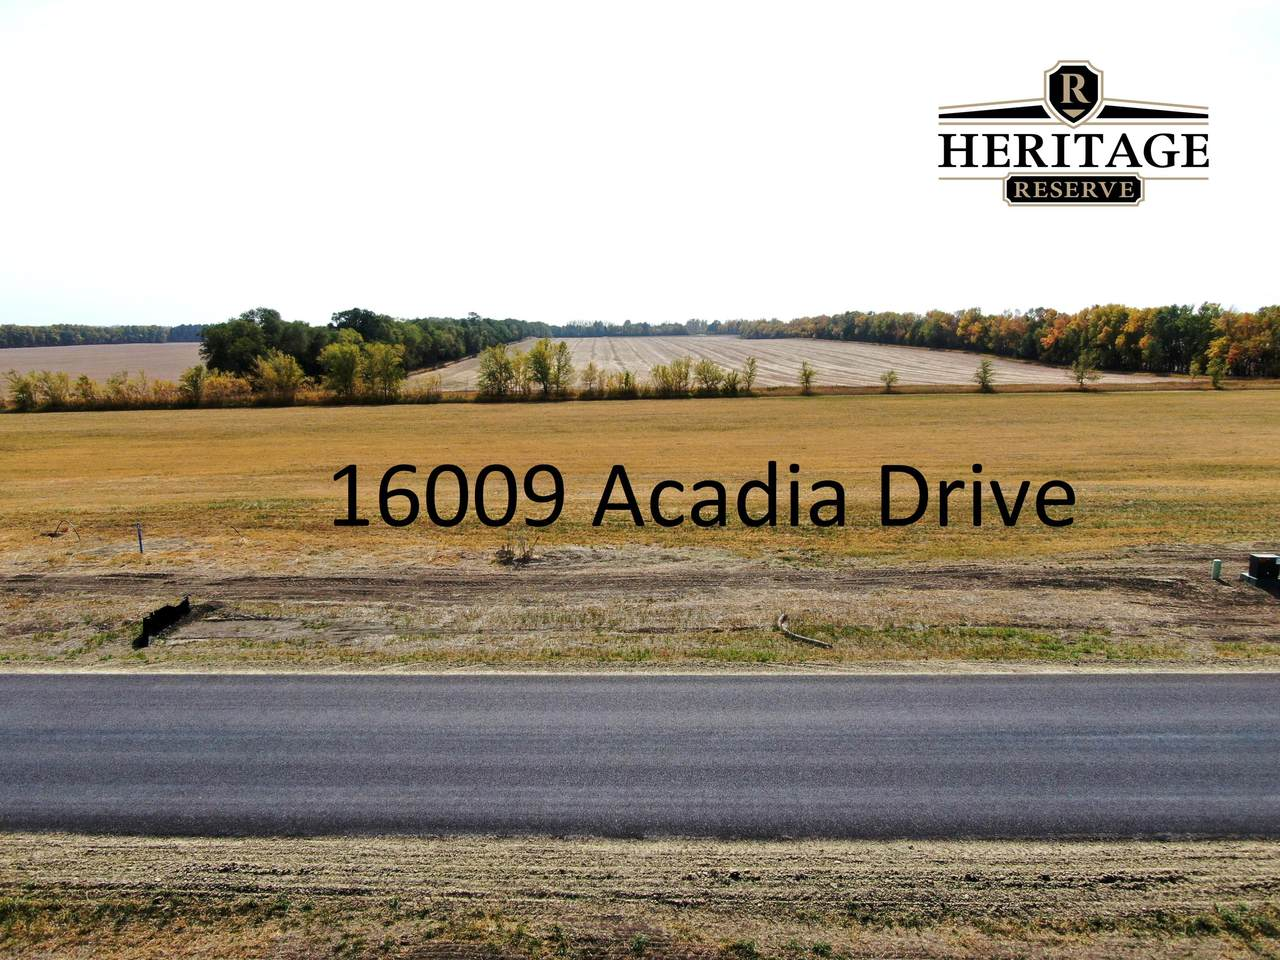 16009 Acadia Drive - Photo 1